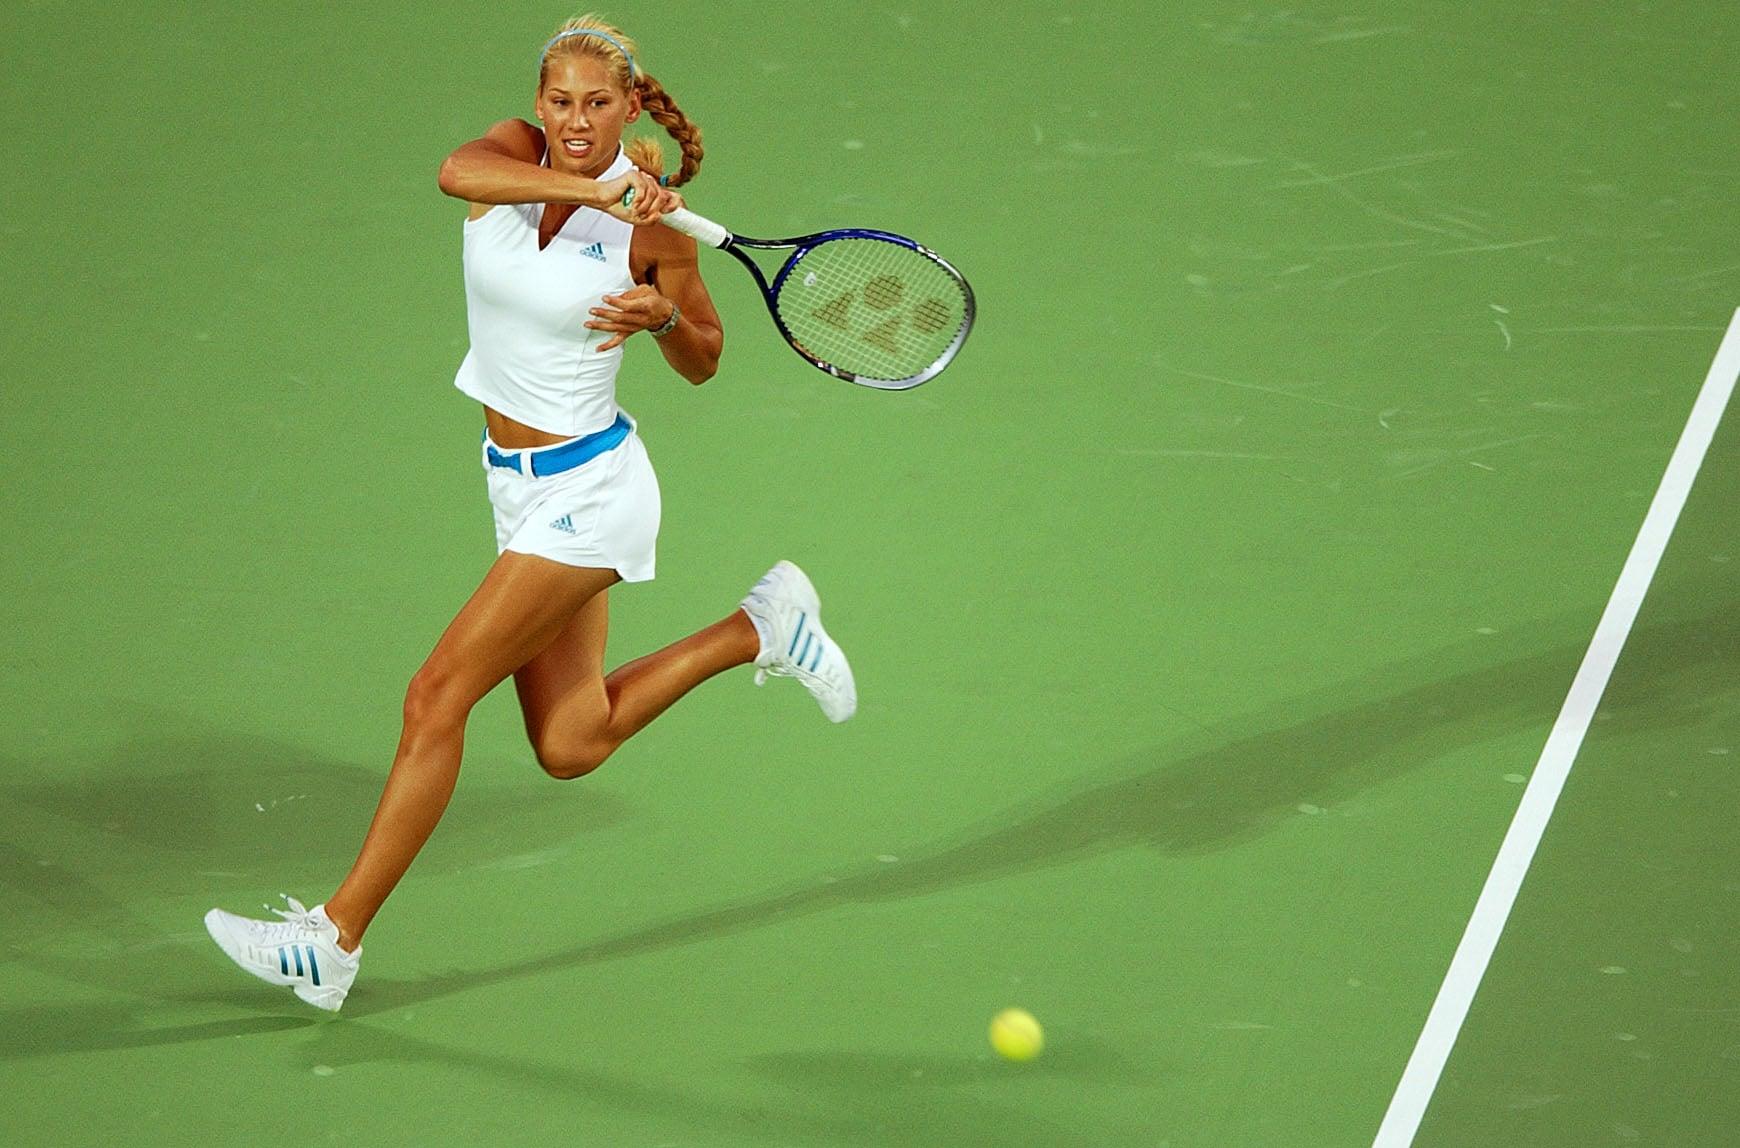 Anna Kournikova displayed her favourite designer brand and colours in an all Adidas tennis attire.